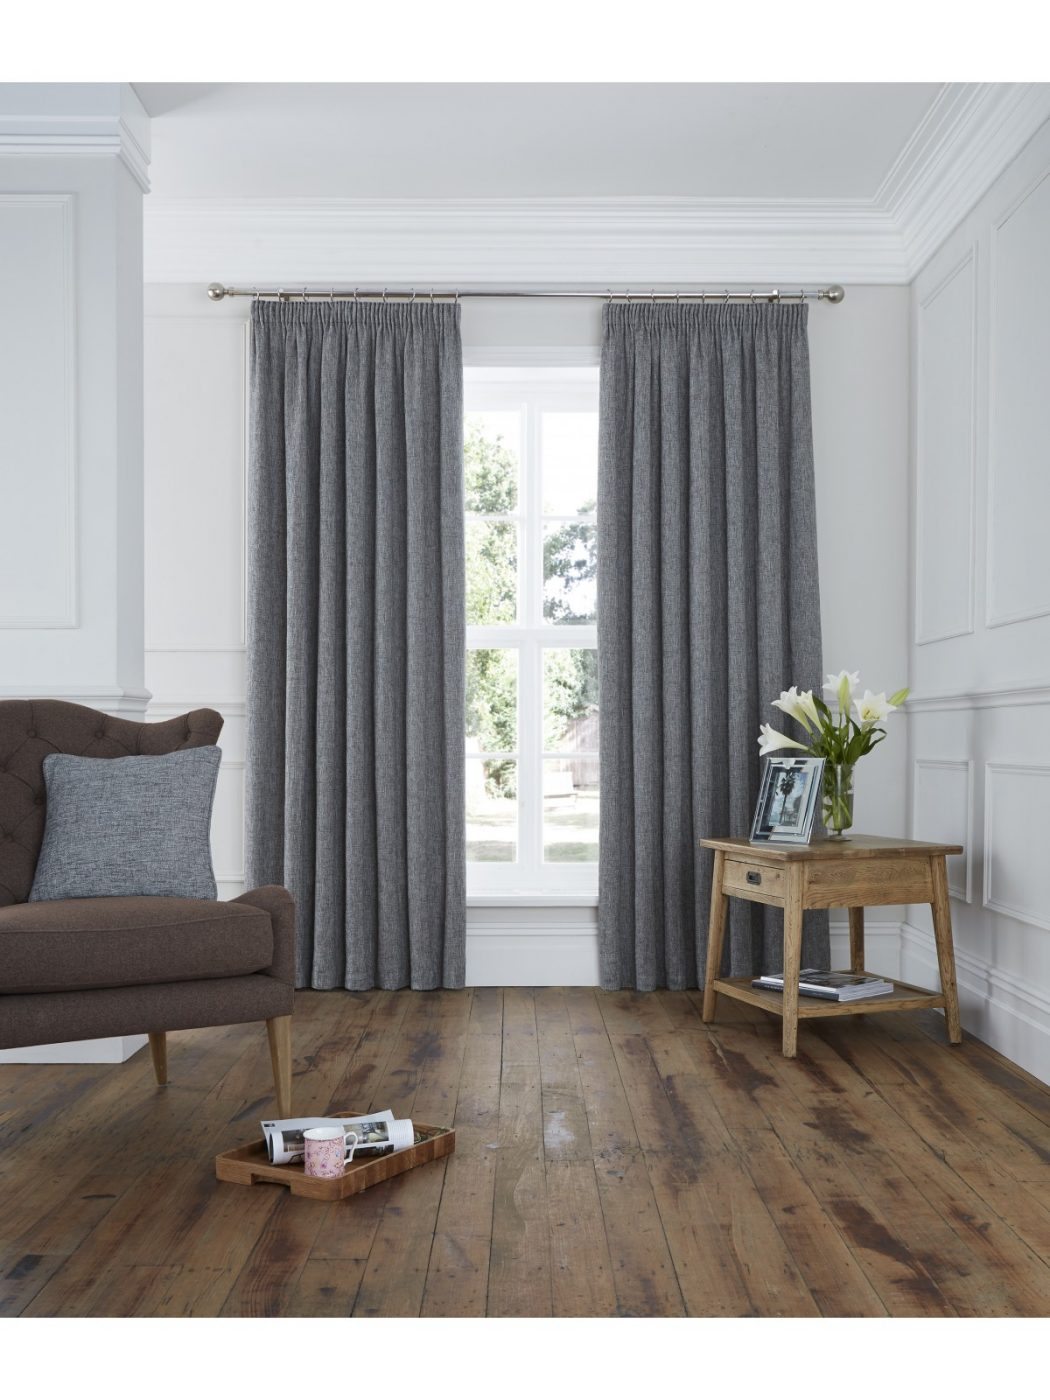 lucerne_plain_pencil_pleat_curtain_grey_1 20+ Hottest Curtain Design Ideas for 2020